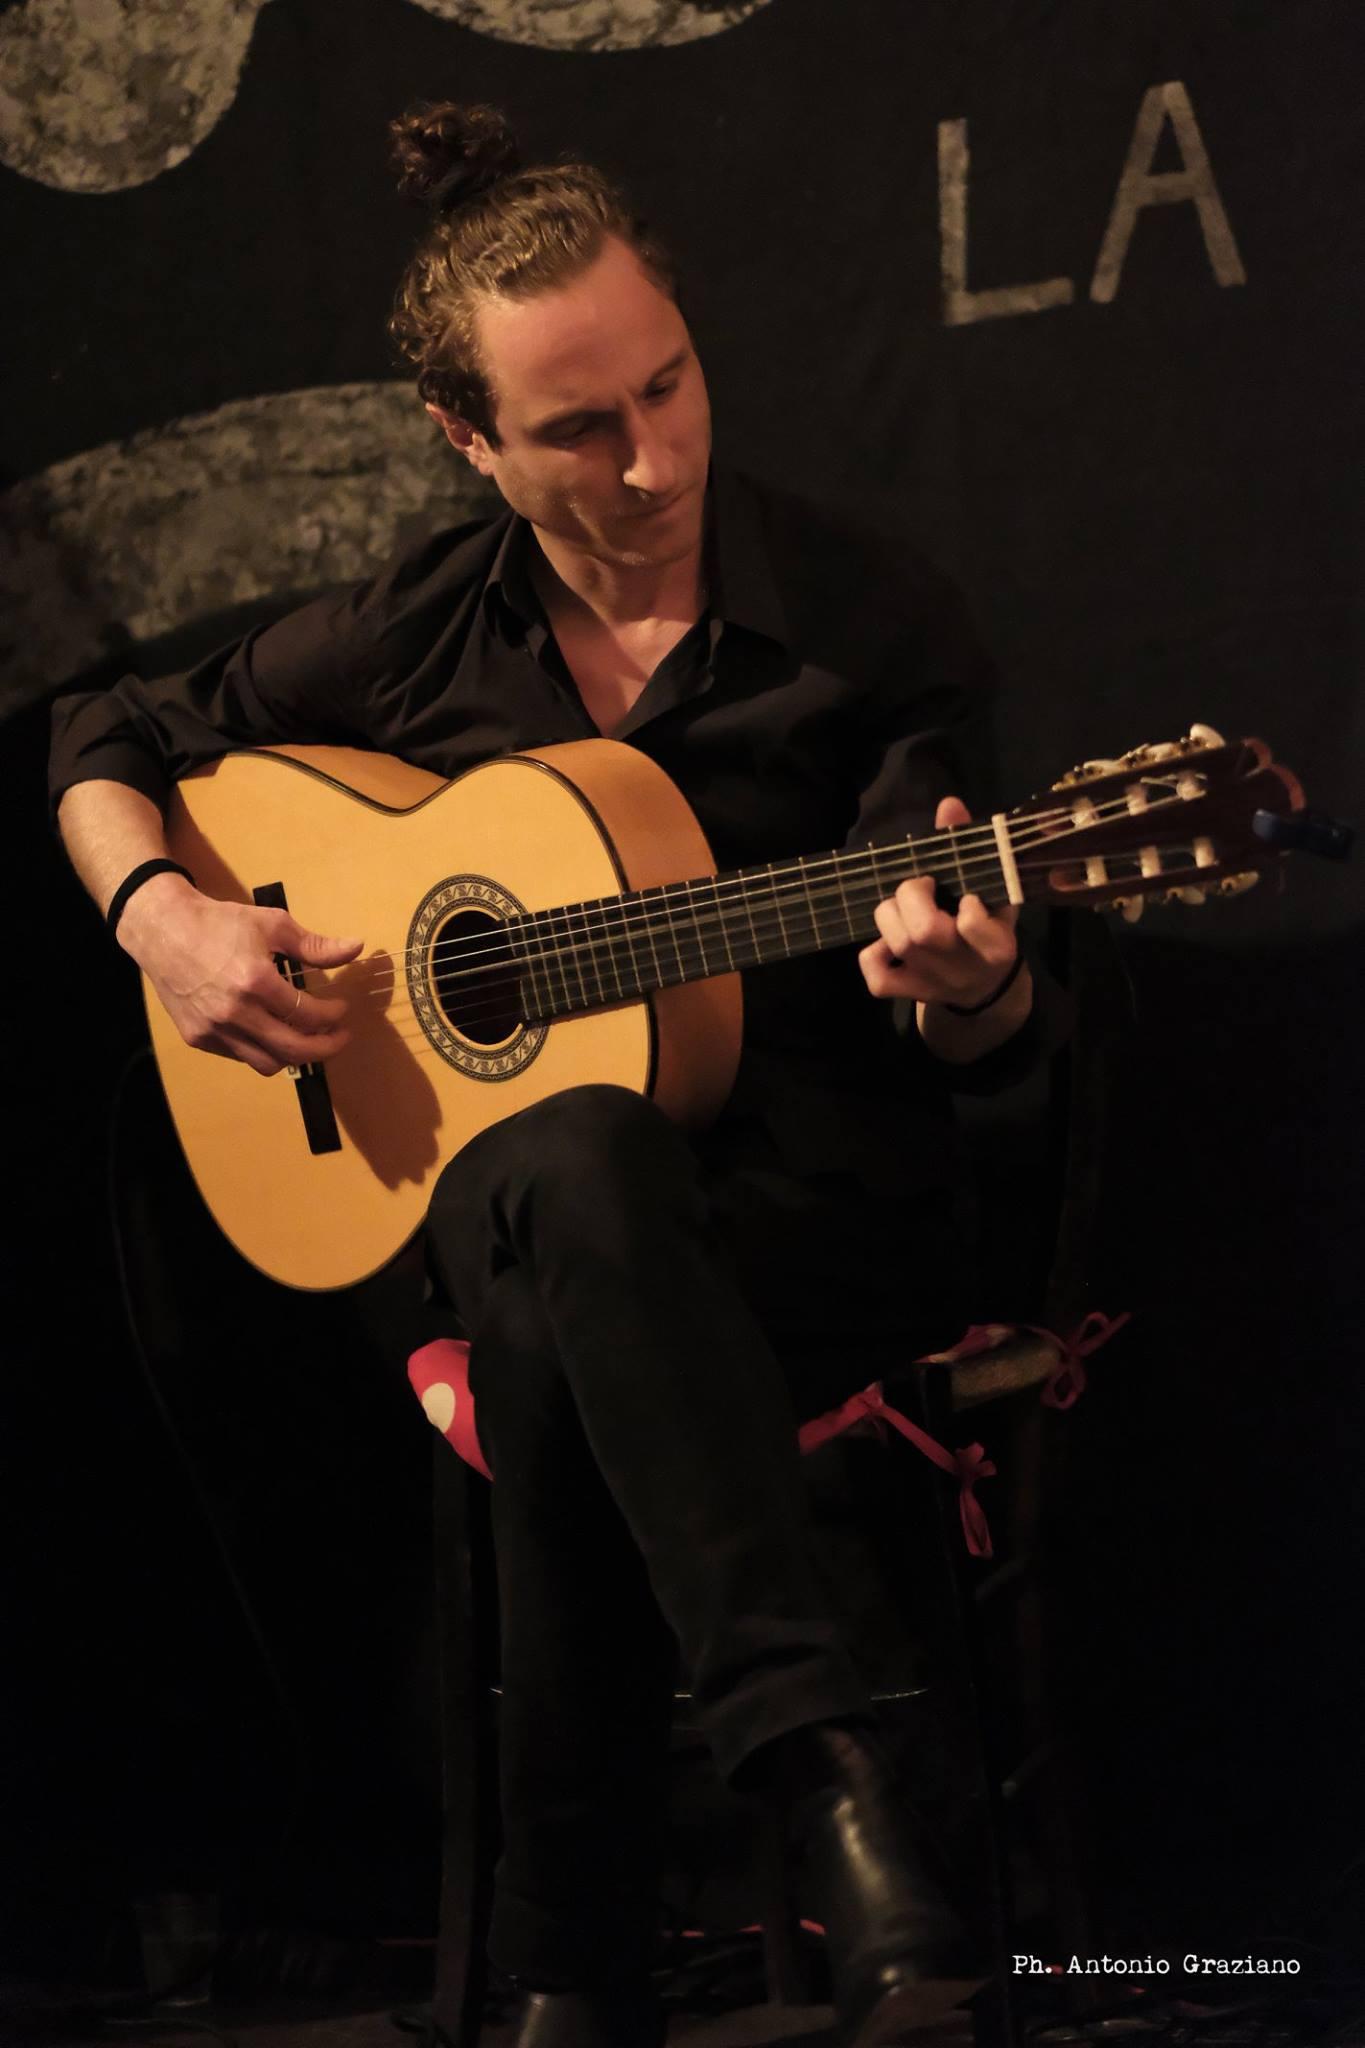 Francesco-de-Vita-ph_-ANtonio-Graziano-1